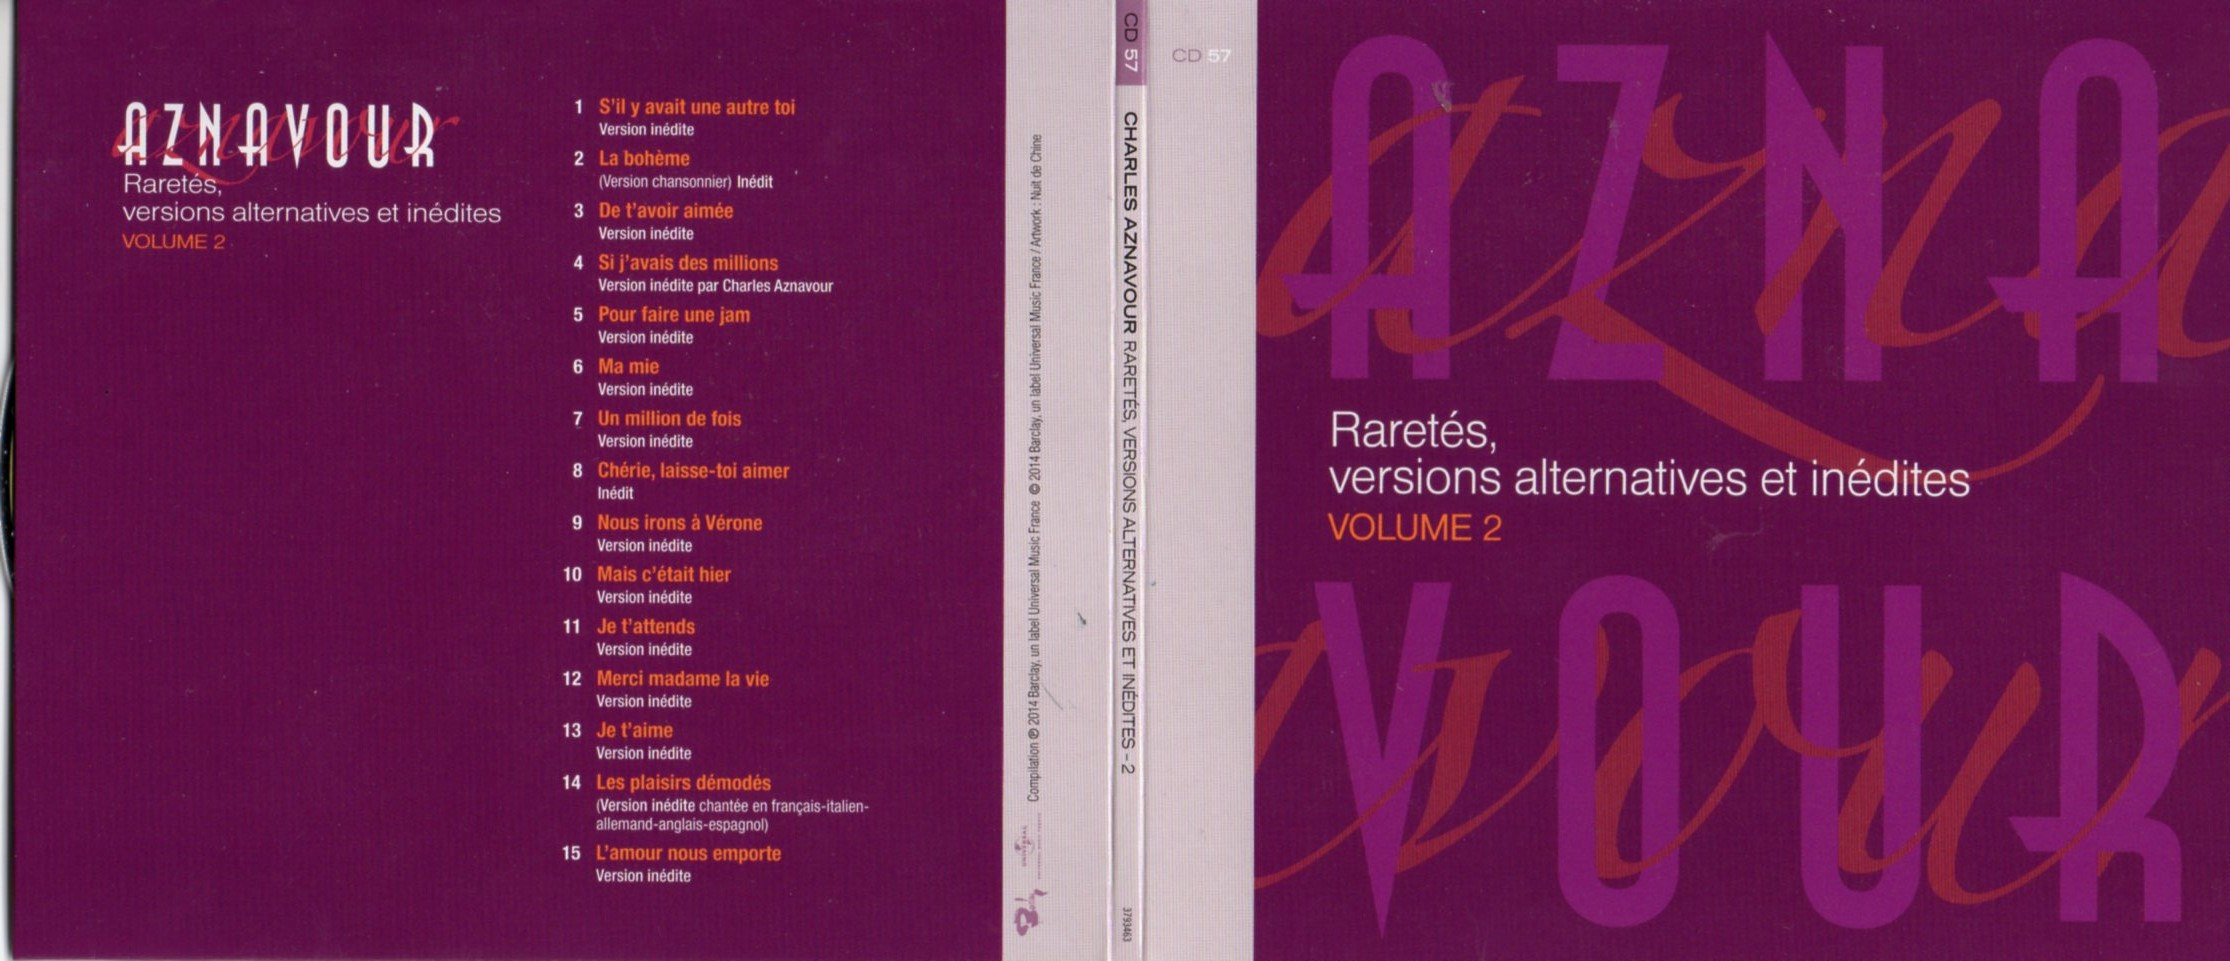 CHARLES AZNAVOUR - Raretés, Versions alternatives et inédites Vol 2 Gatefold Card board sleeve - CD